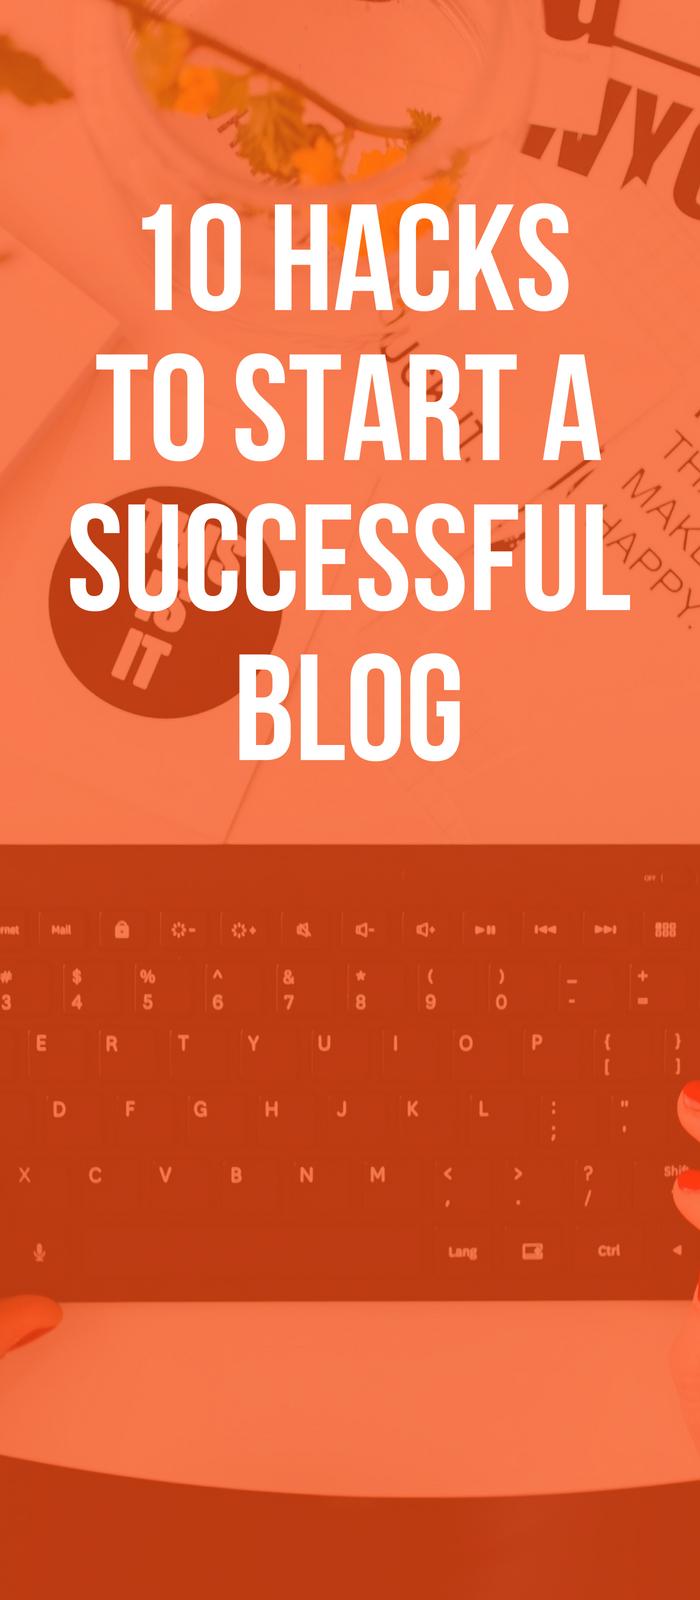 10 Hacks To Start A Successful Blog.jpg